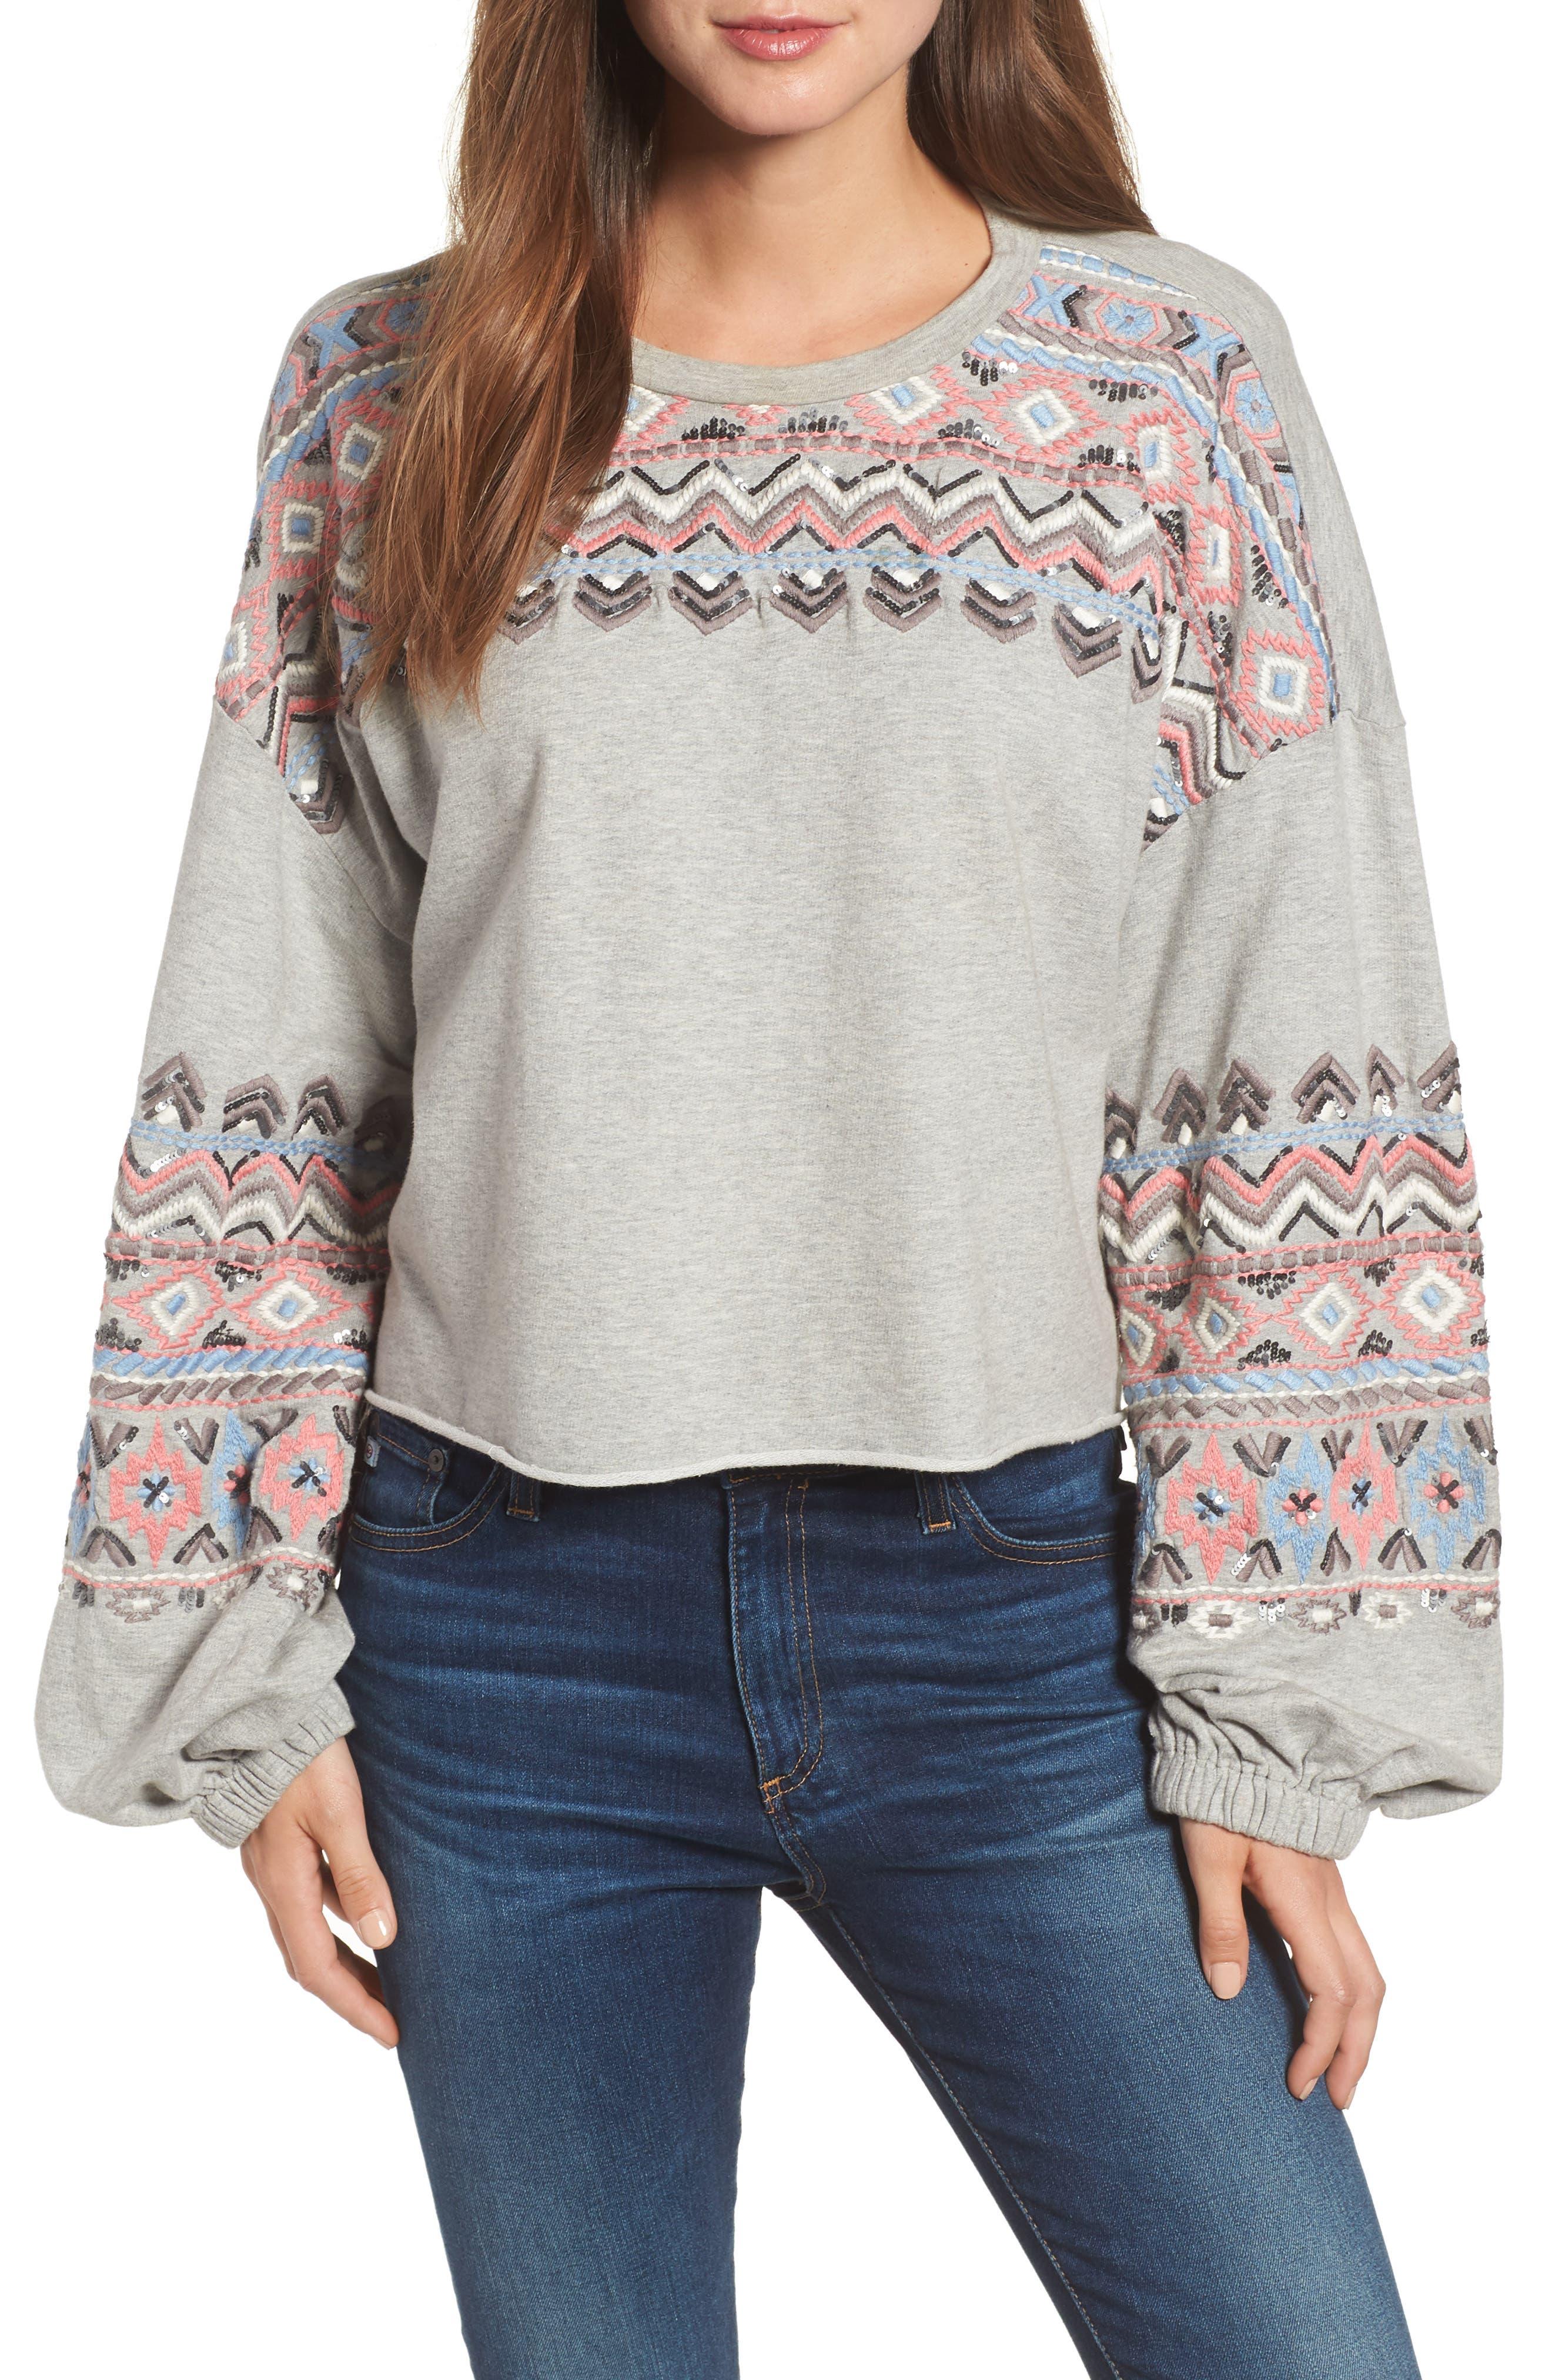 KAS NEW YORK Embroidered Beaded Sweatshirt